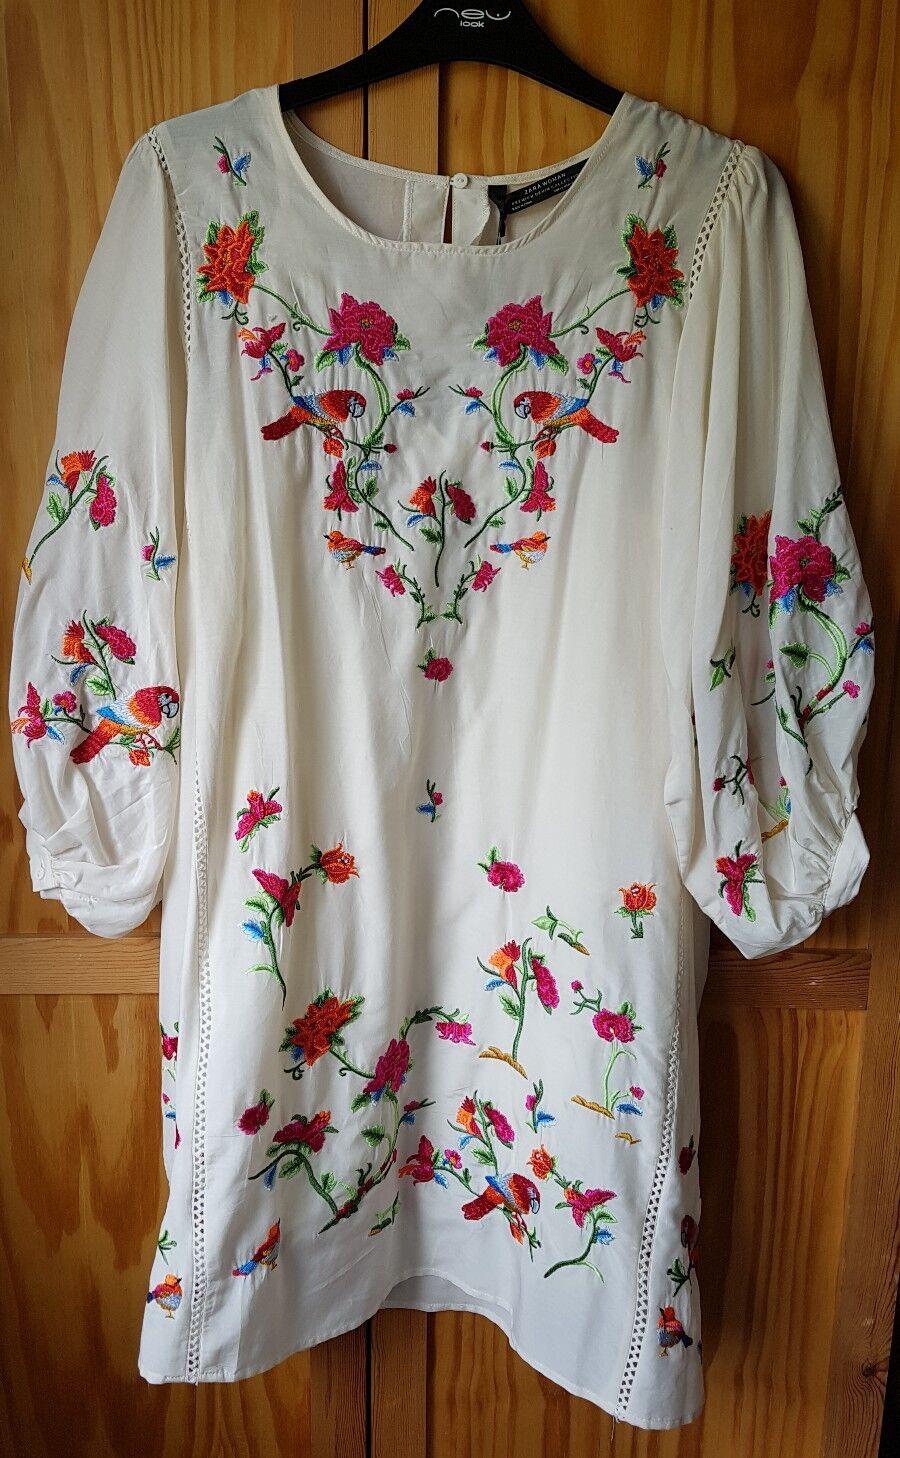 b2d6b2b6 ZARA cream off-white floral floral floral embroidered summer dress, cotton  silk, size XS, BNWT a1d123